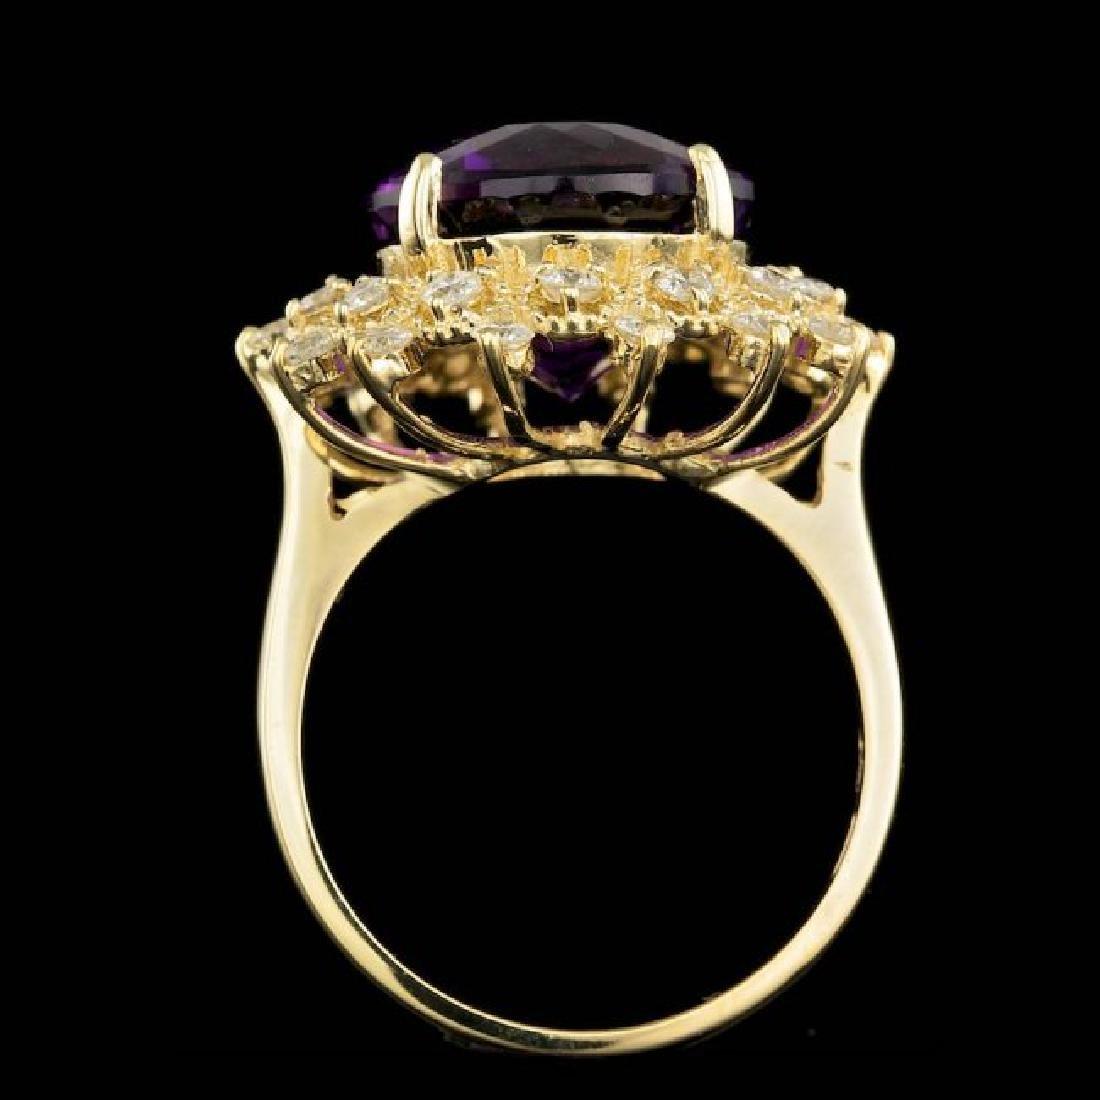 14k Gold 8.00ct Amethyst 0.80ct Diamond Ring - 3